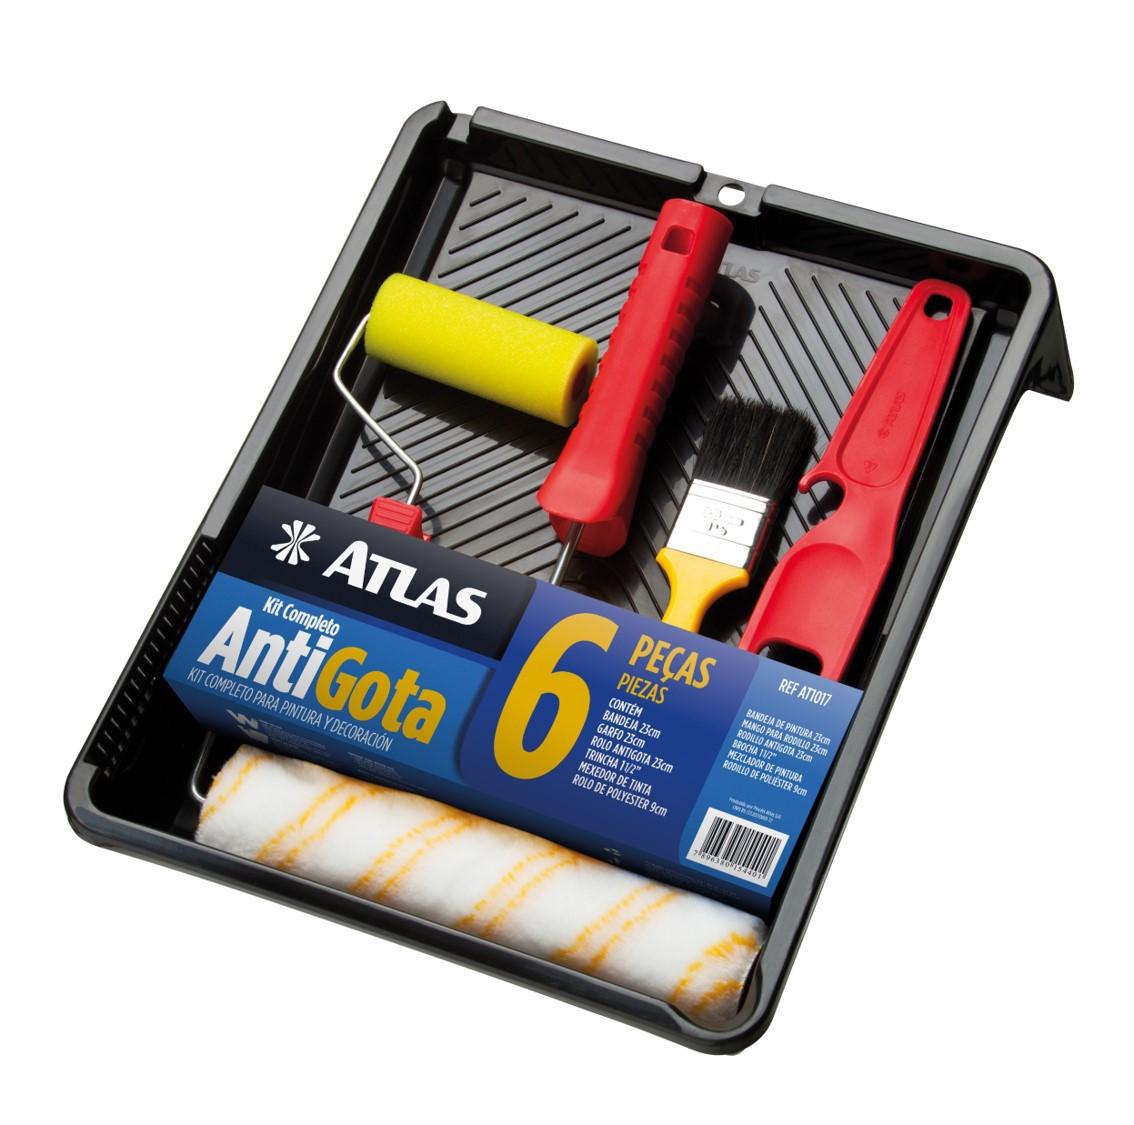 Kit Antigota Completo Atlas 6 Peças AT1017.